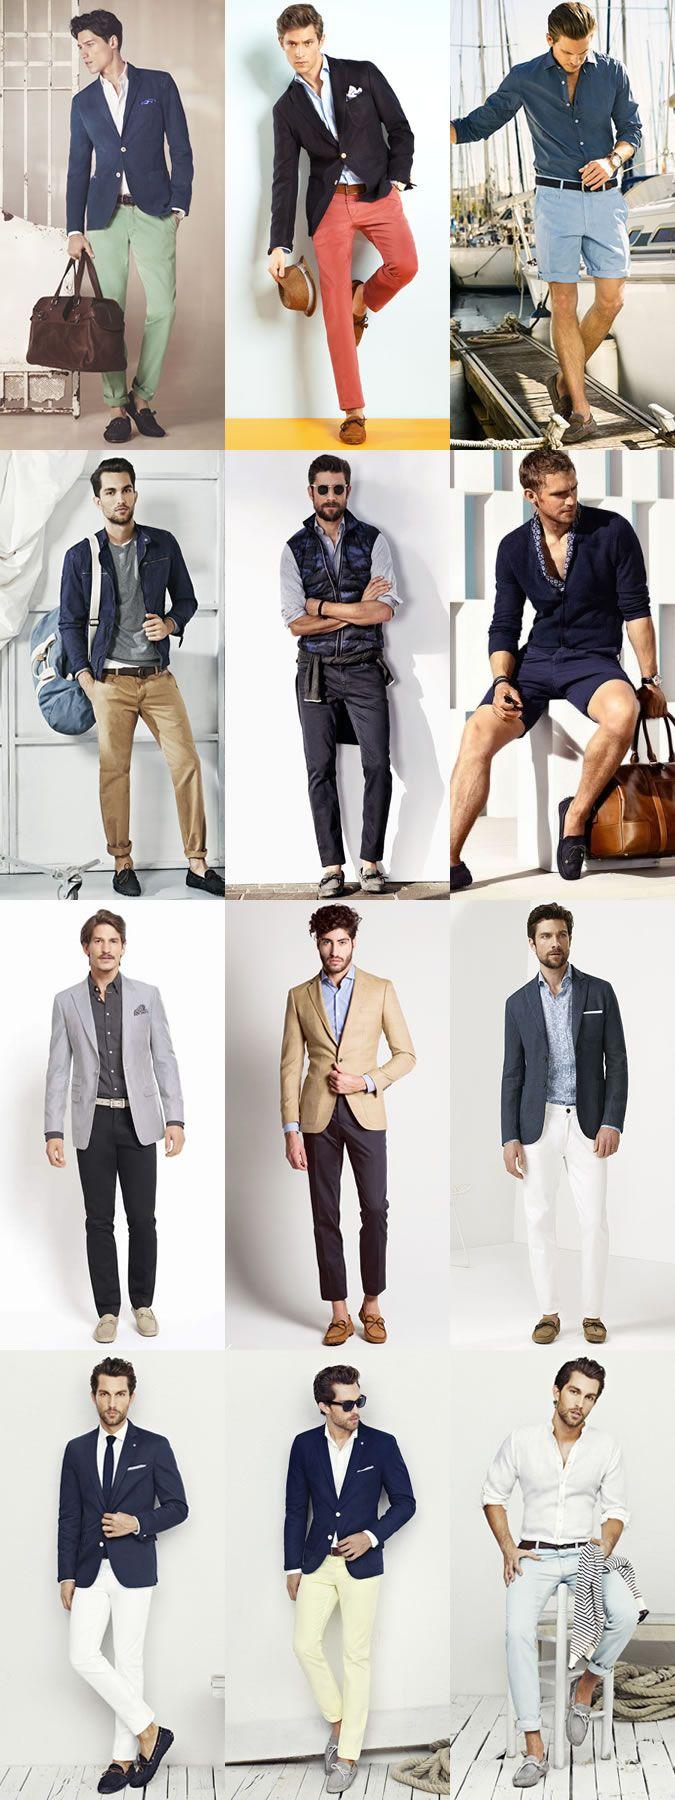 Men's Alternative Summer Shoes : Driving Shoes Lookbook Inspiration